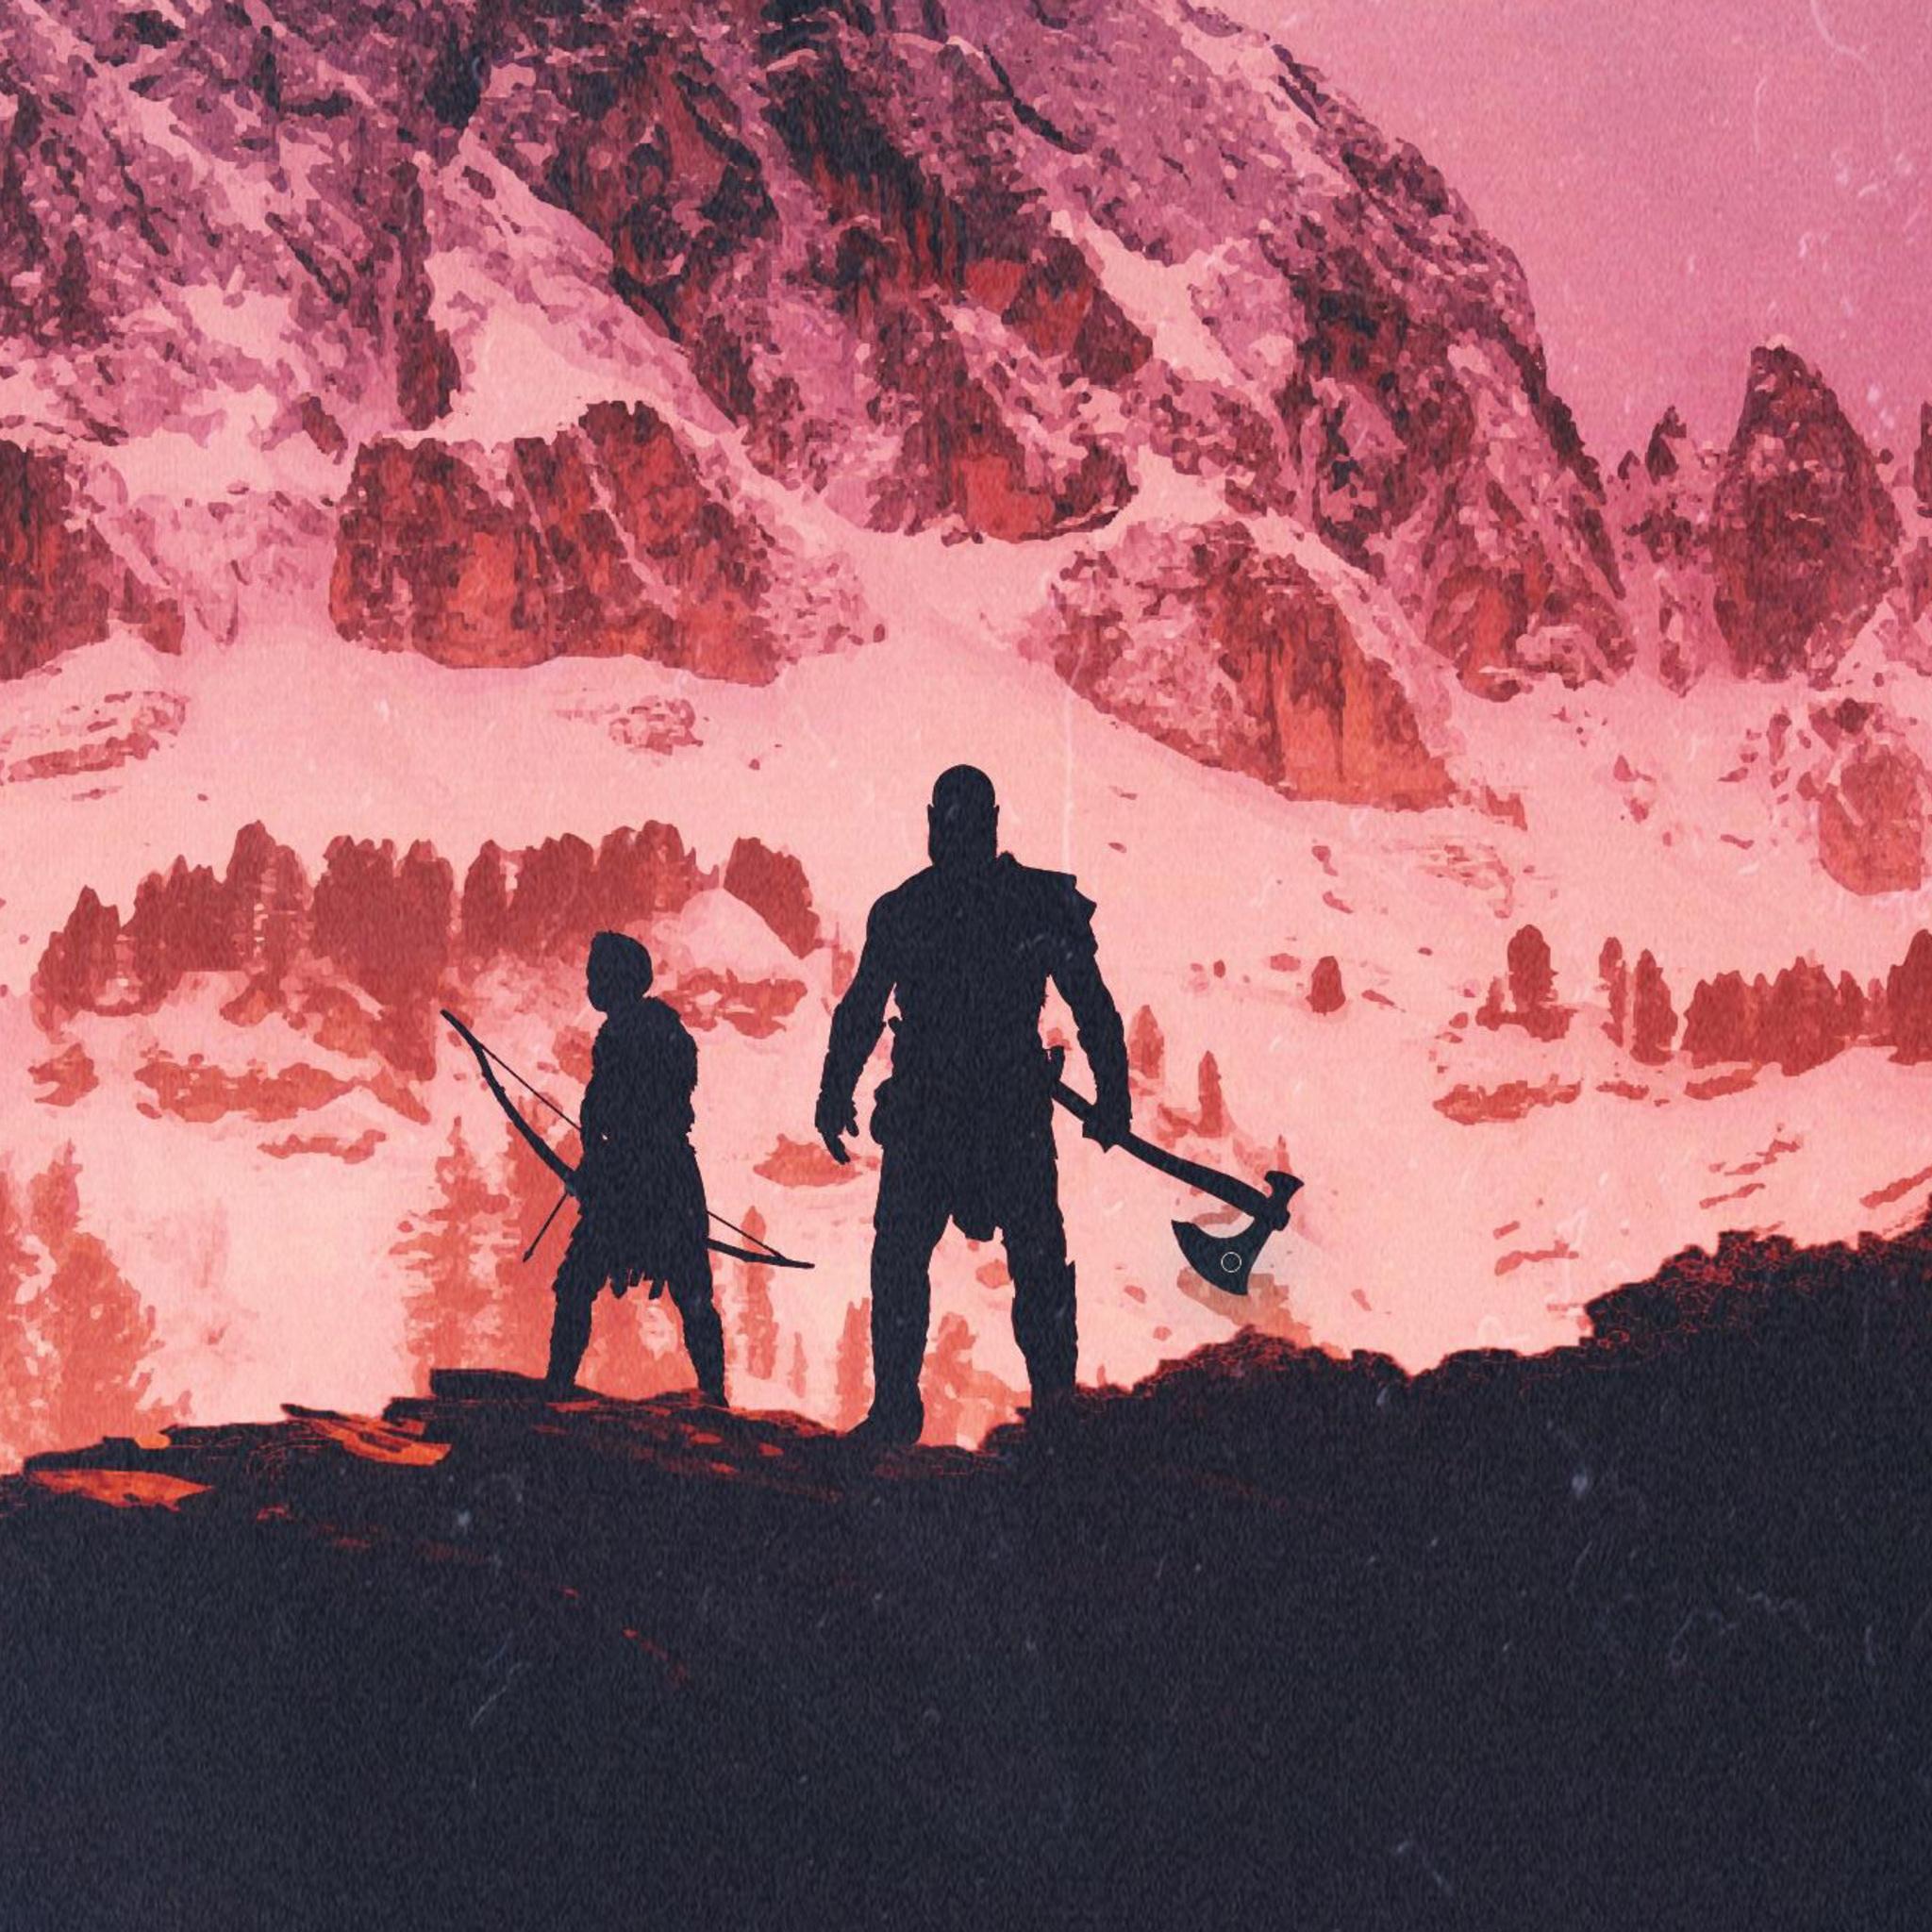 god-of-war-4-kratos-and-atreus-artwork-ru.jpg